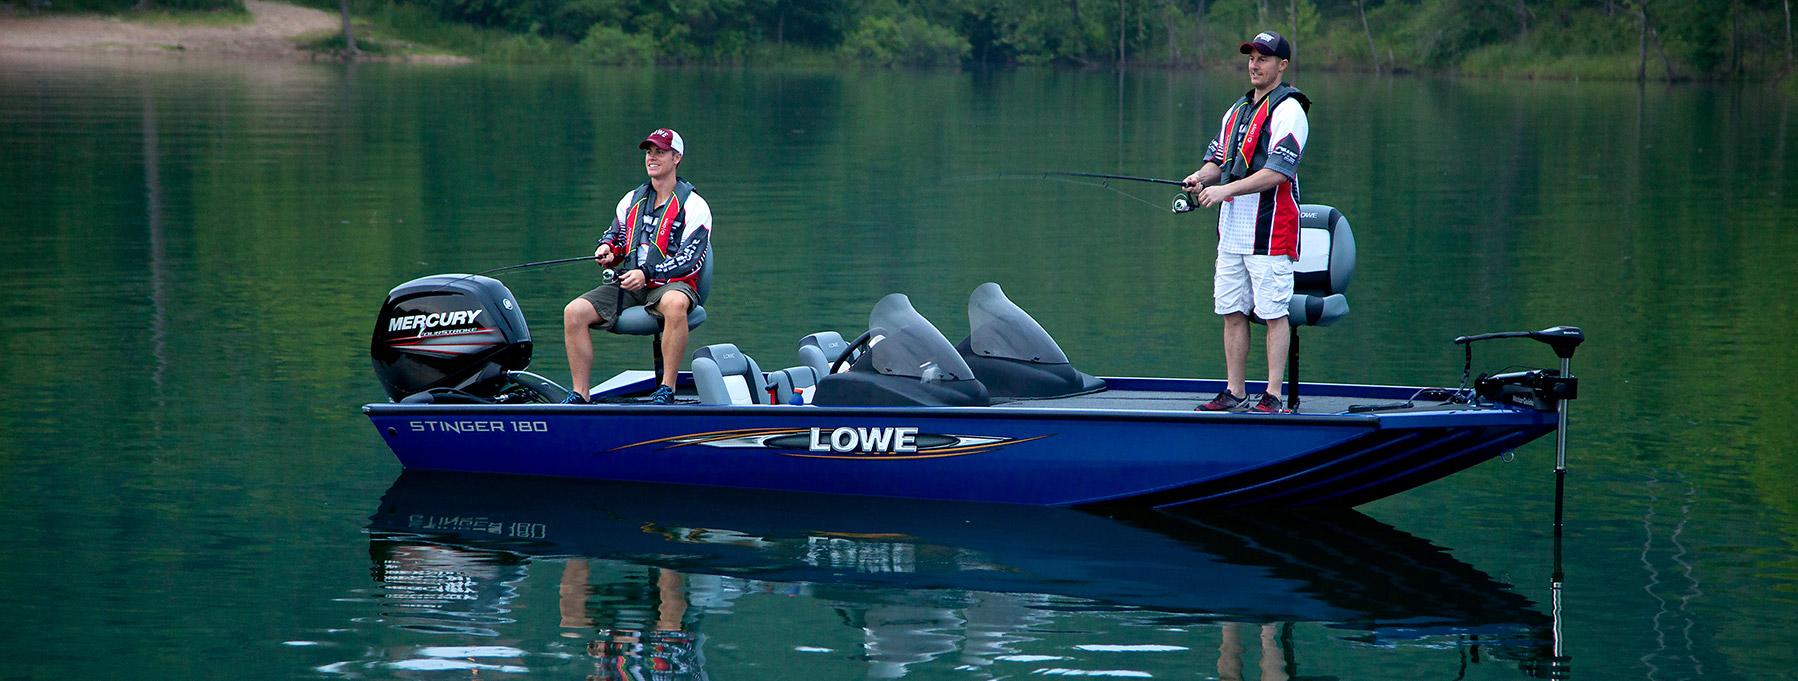 2016 Stinger ST 180 Bass & Crappie Aluminum Fishing Boat | Lowe Boats